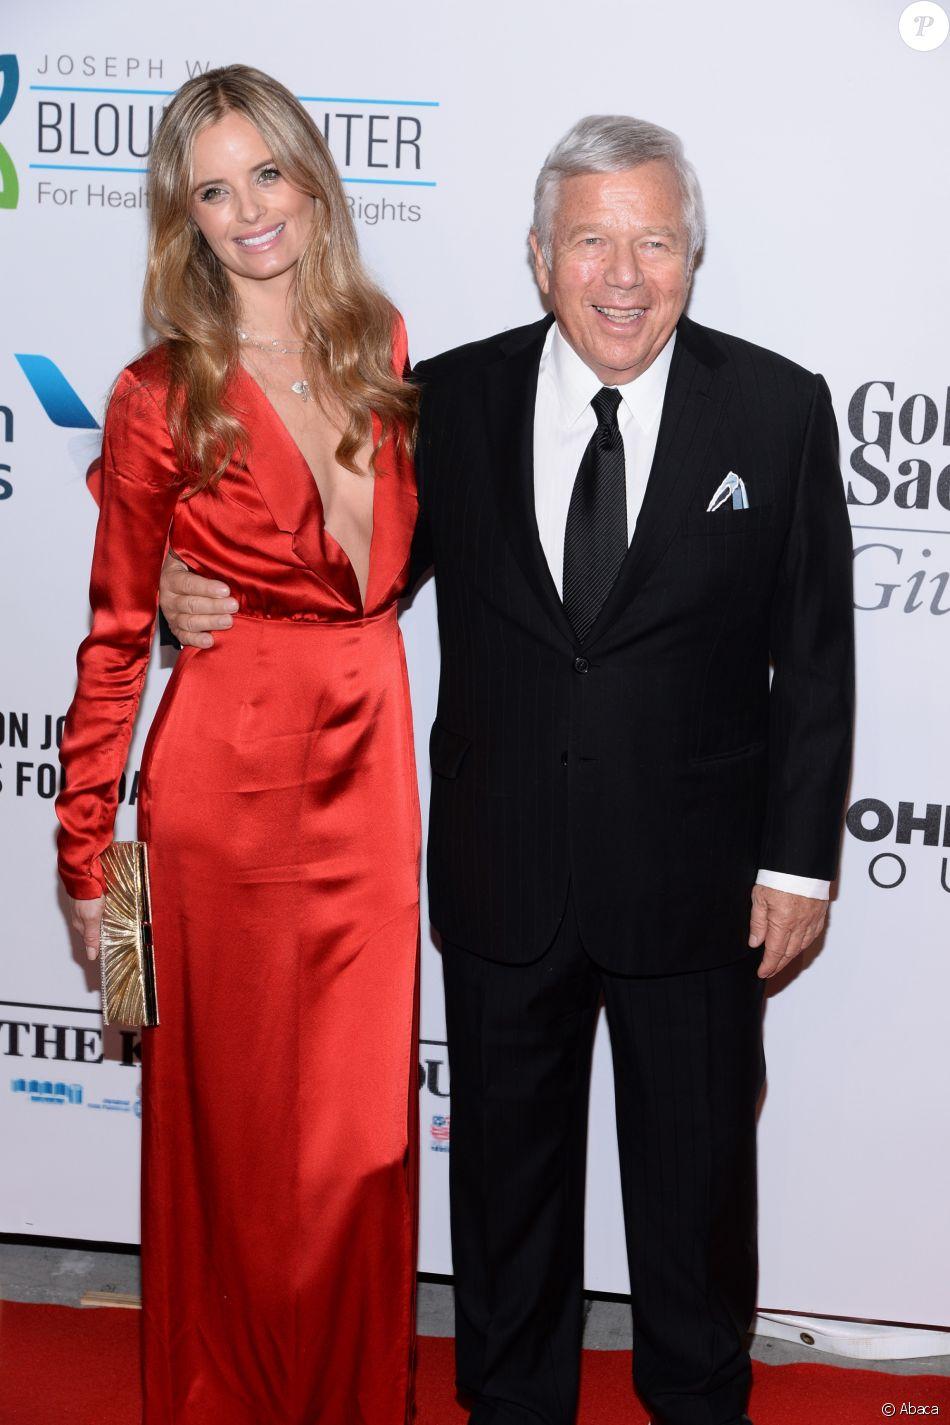 Ricki Noel Lander et Robert Kraft le 28 octobre 2014 lors du 13e gala de la Fondation d'Elton John contre le sida à New York.